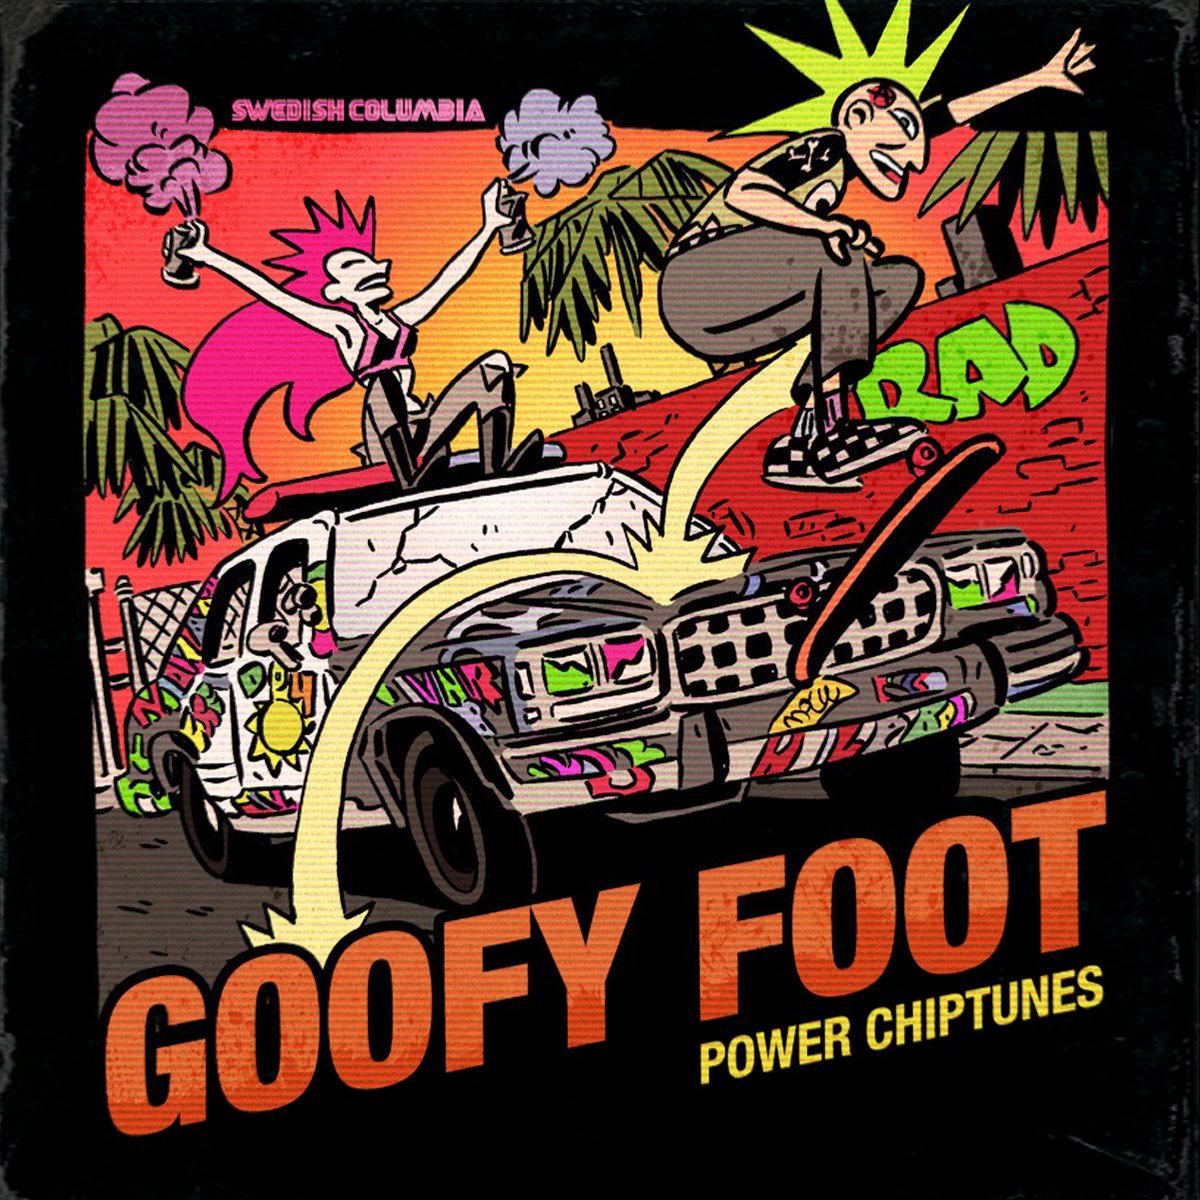 Goofy Foot: Power Chiptunes | Swedish Columbia